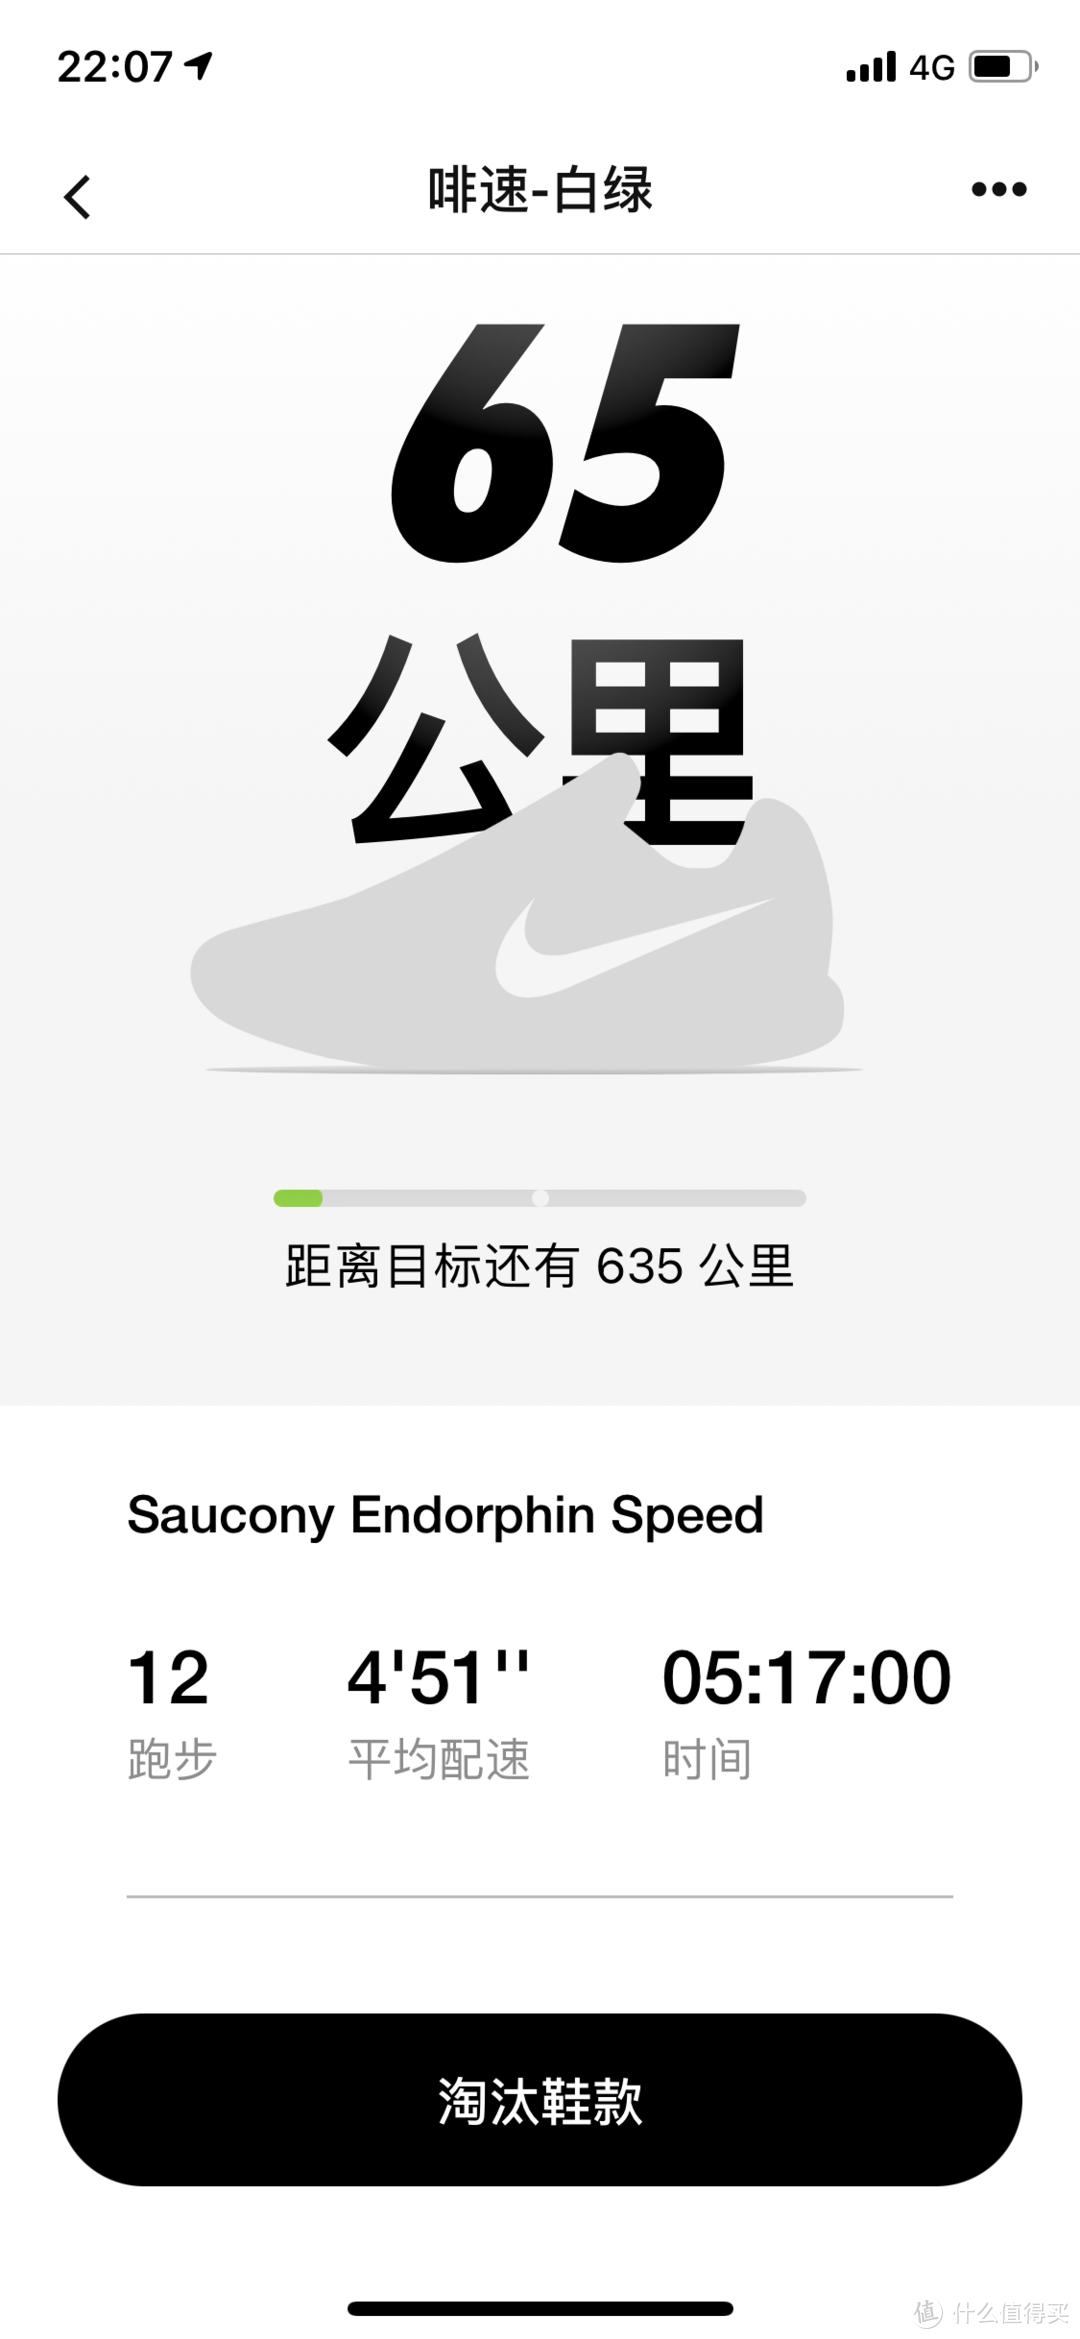 Saucony Endorphin Speed 索康尼啡速白绿配色综合评测